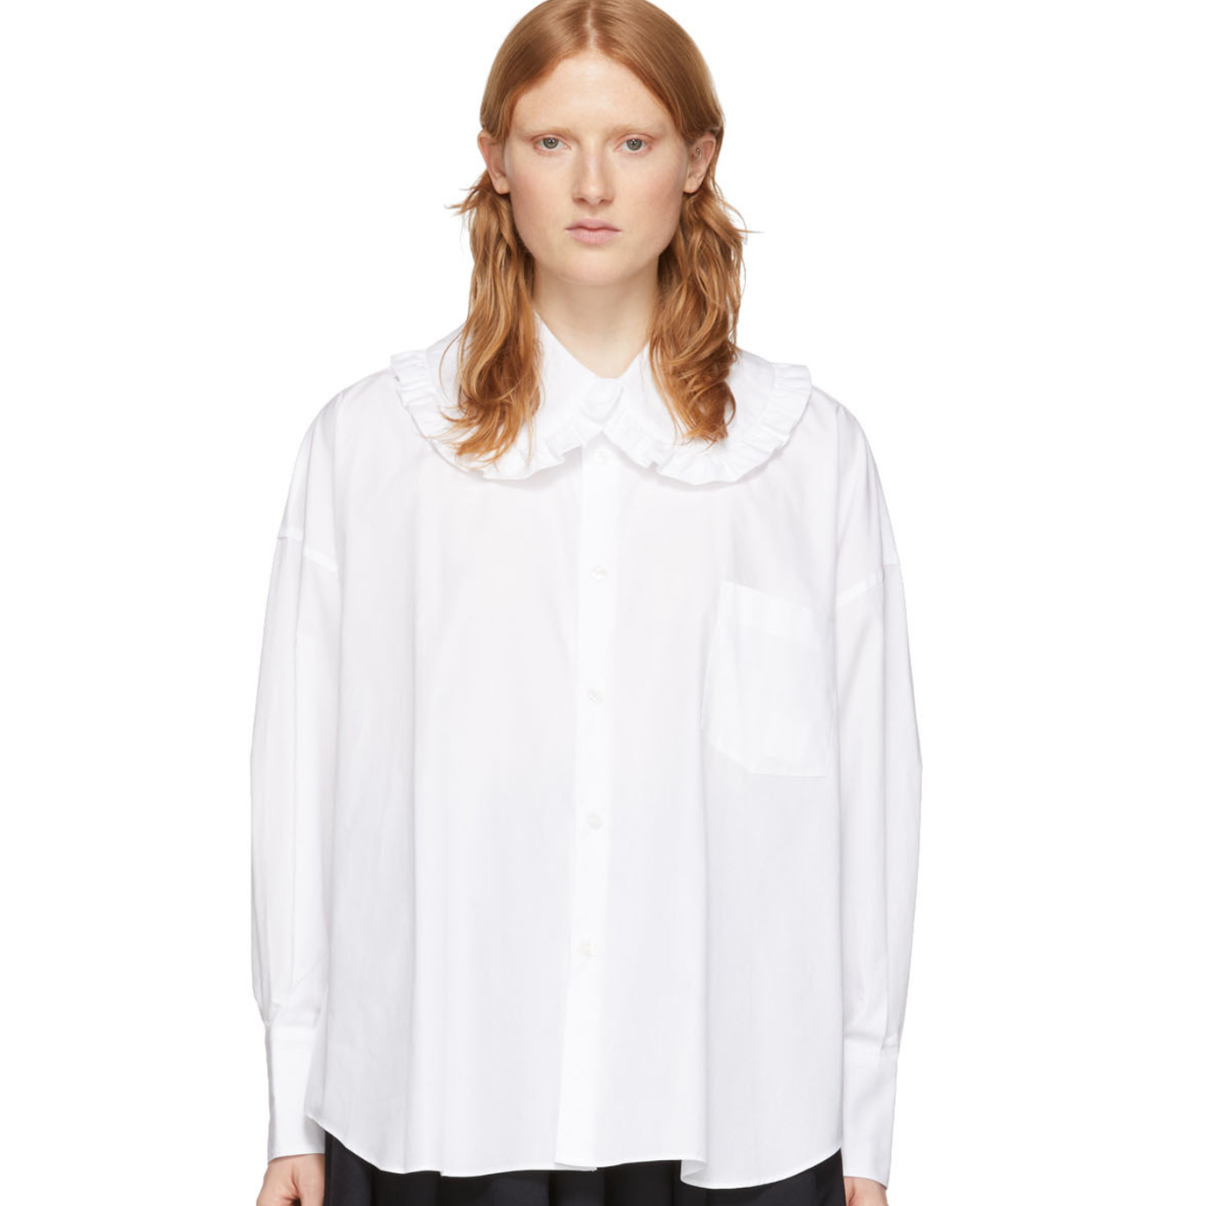 Comme des Garçons Girl 白色荷叶边圆尾翻领衬衫